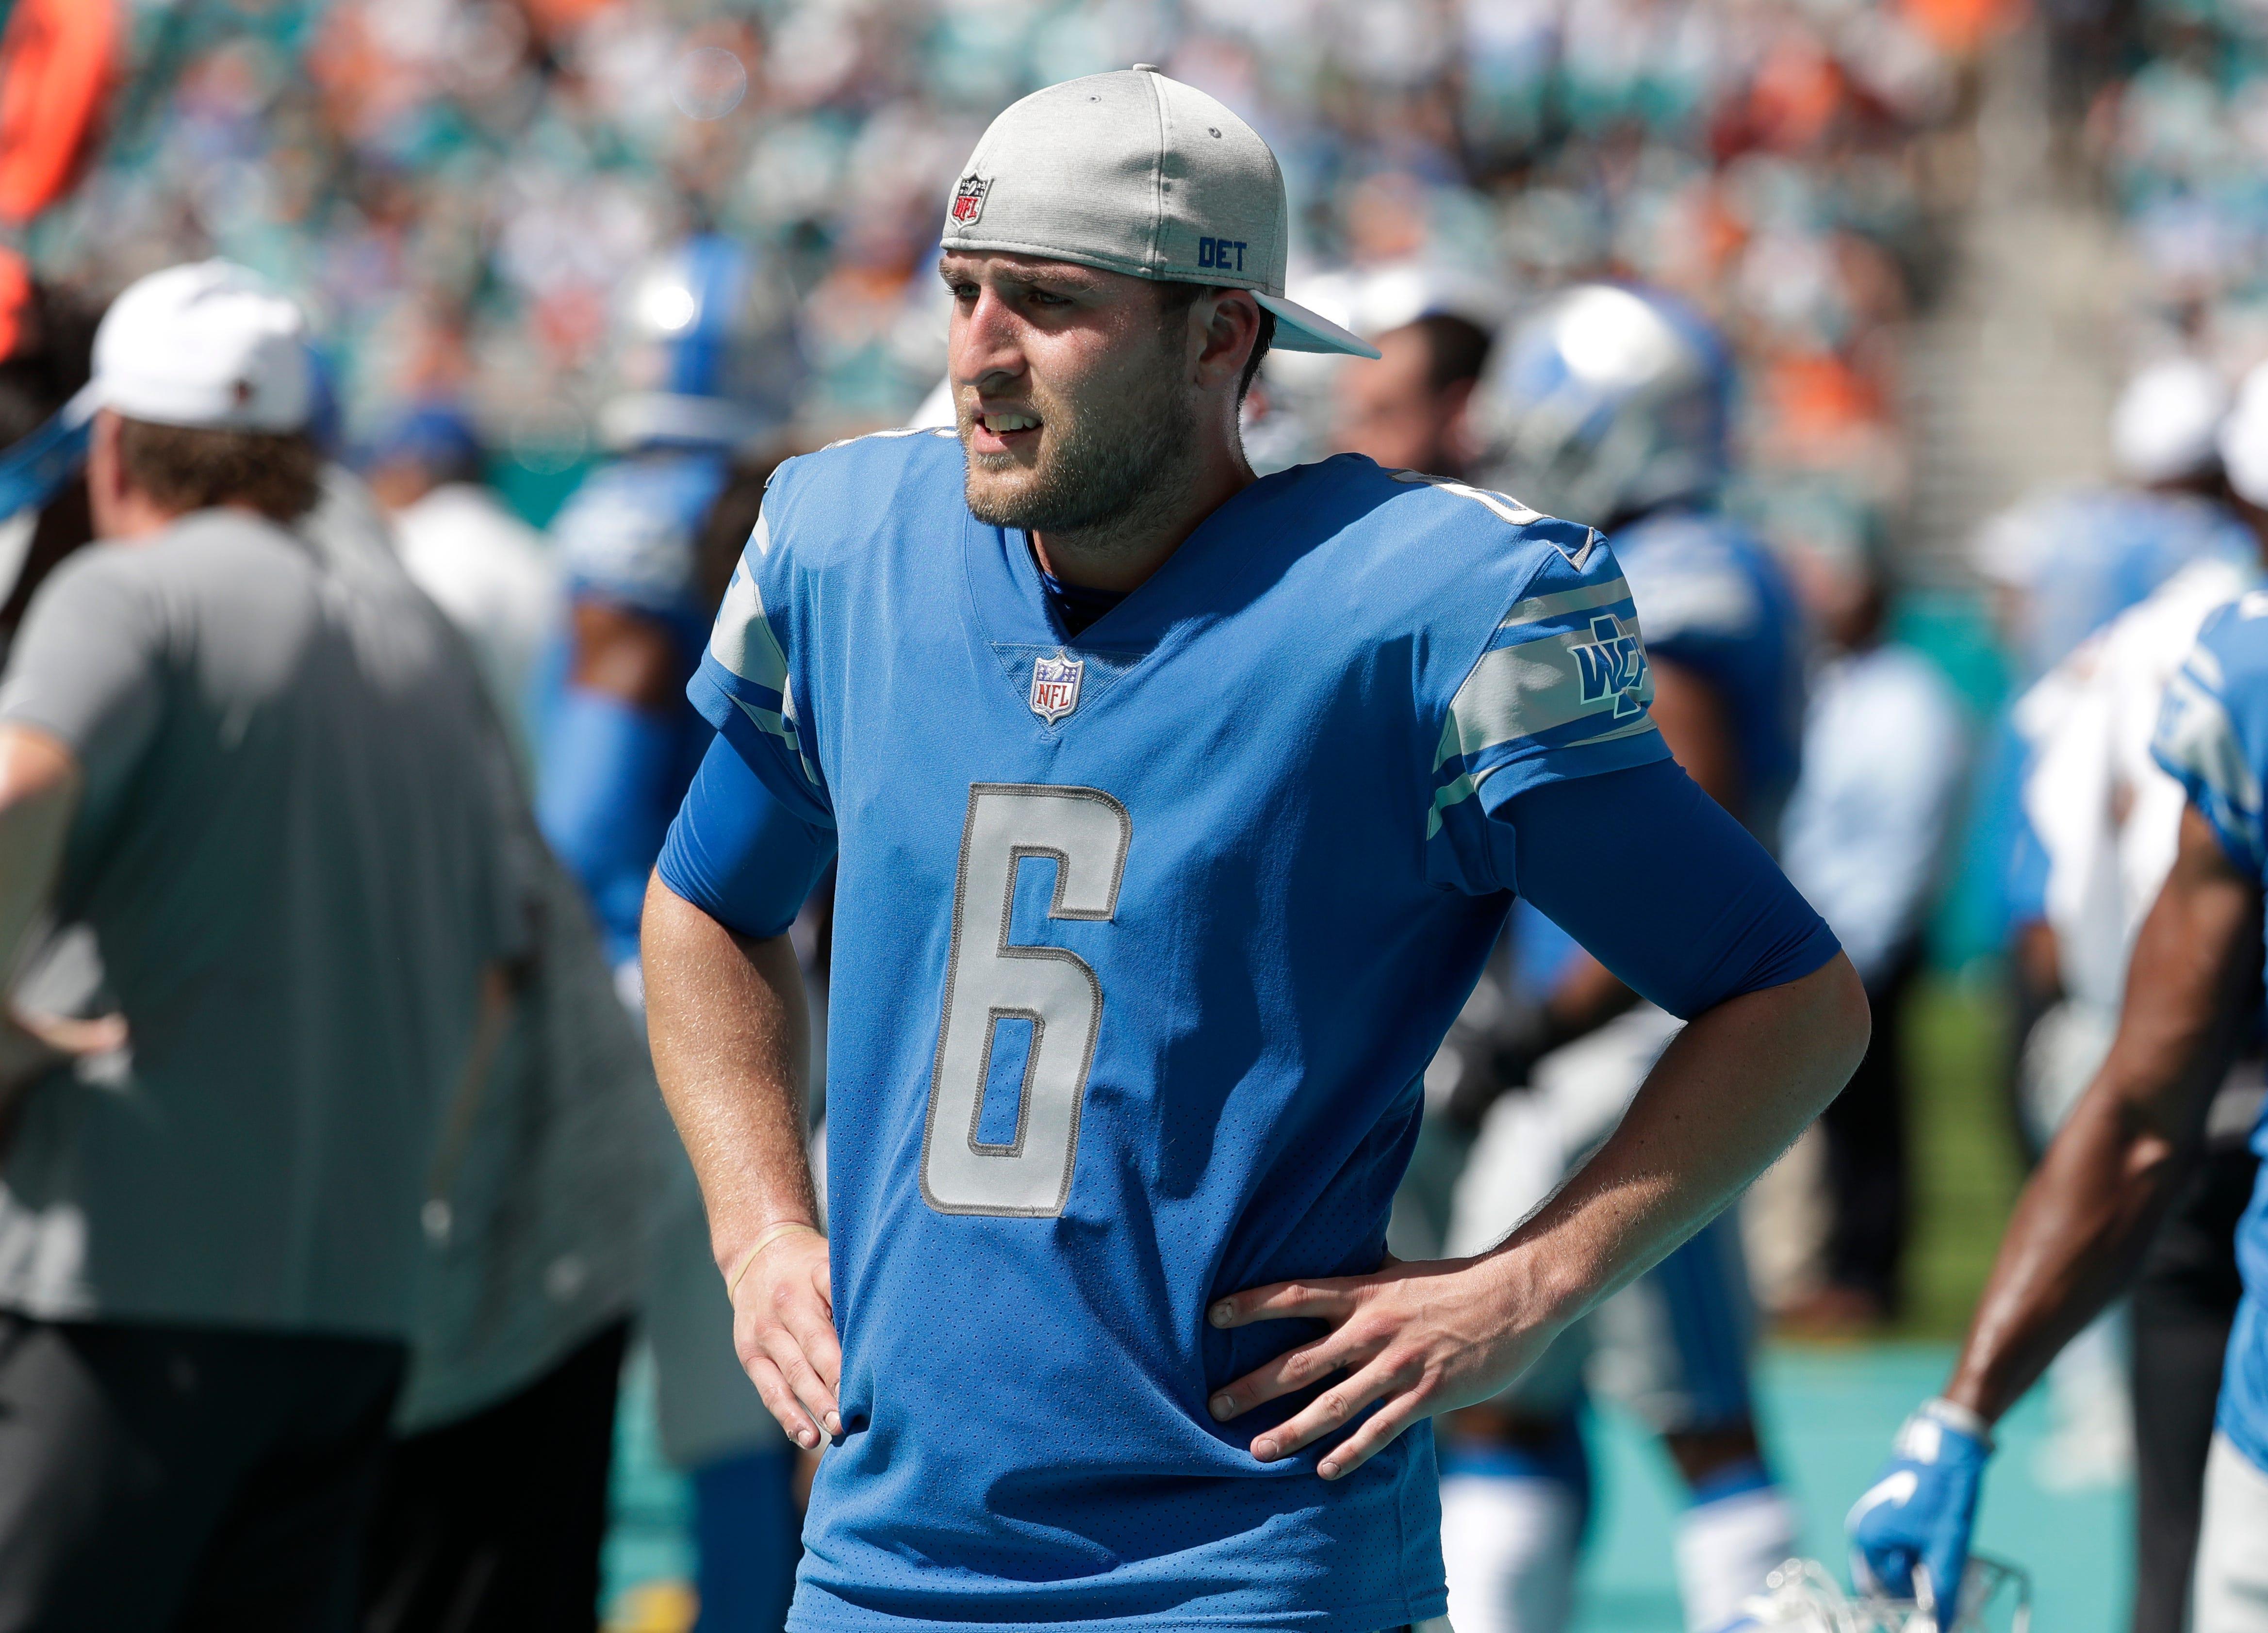 Detroit Lions punter Sam Martin on hospitalization: 'It was precautionary. I'm all good'